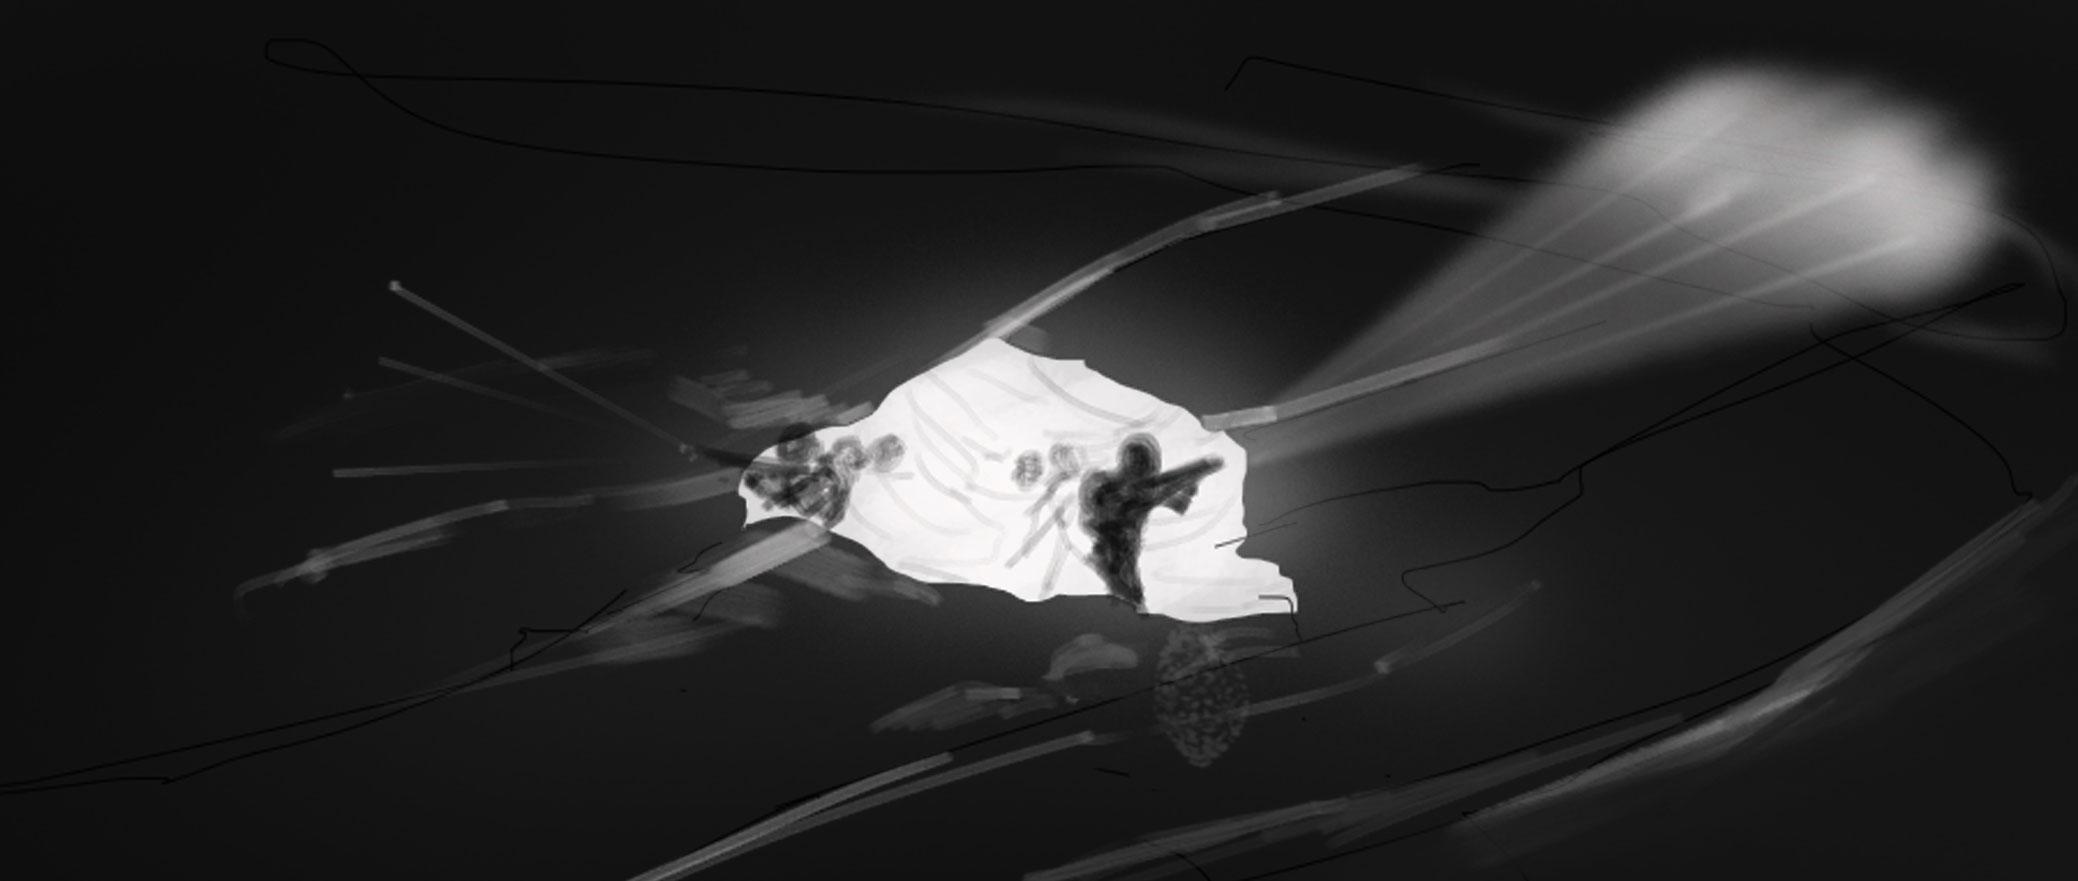 Wraiths_2019Animatic_Thumbsheet-02_59.jpg